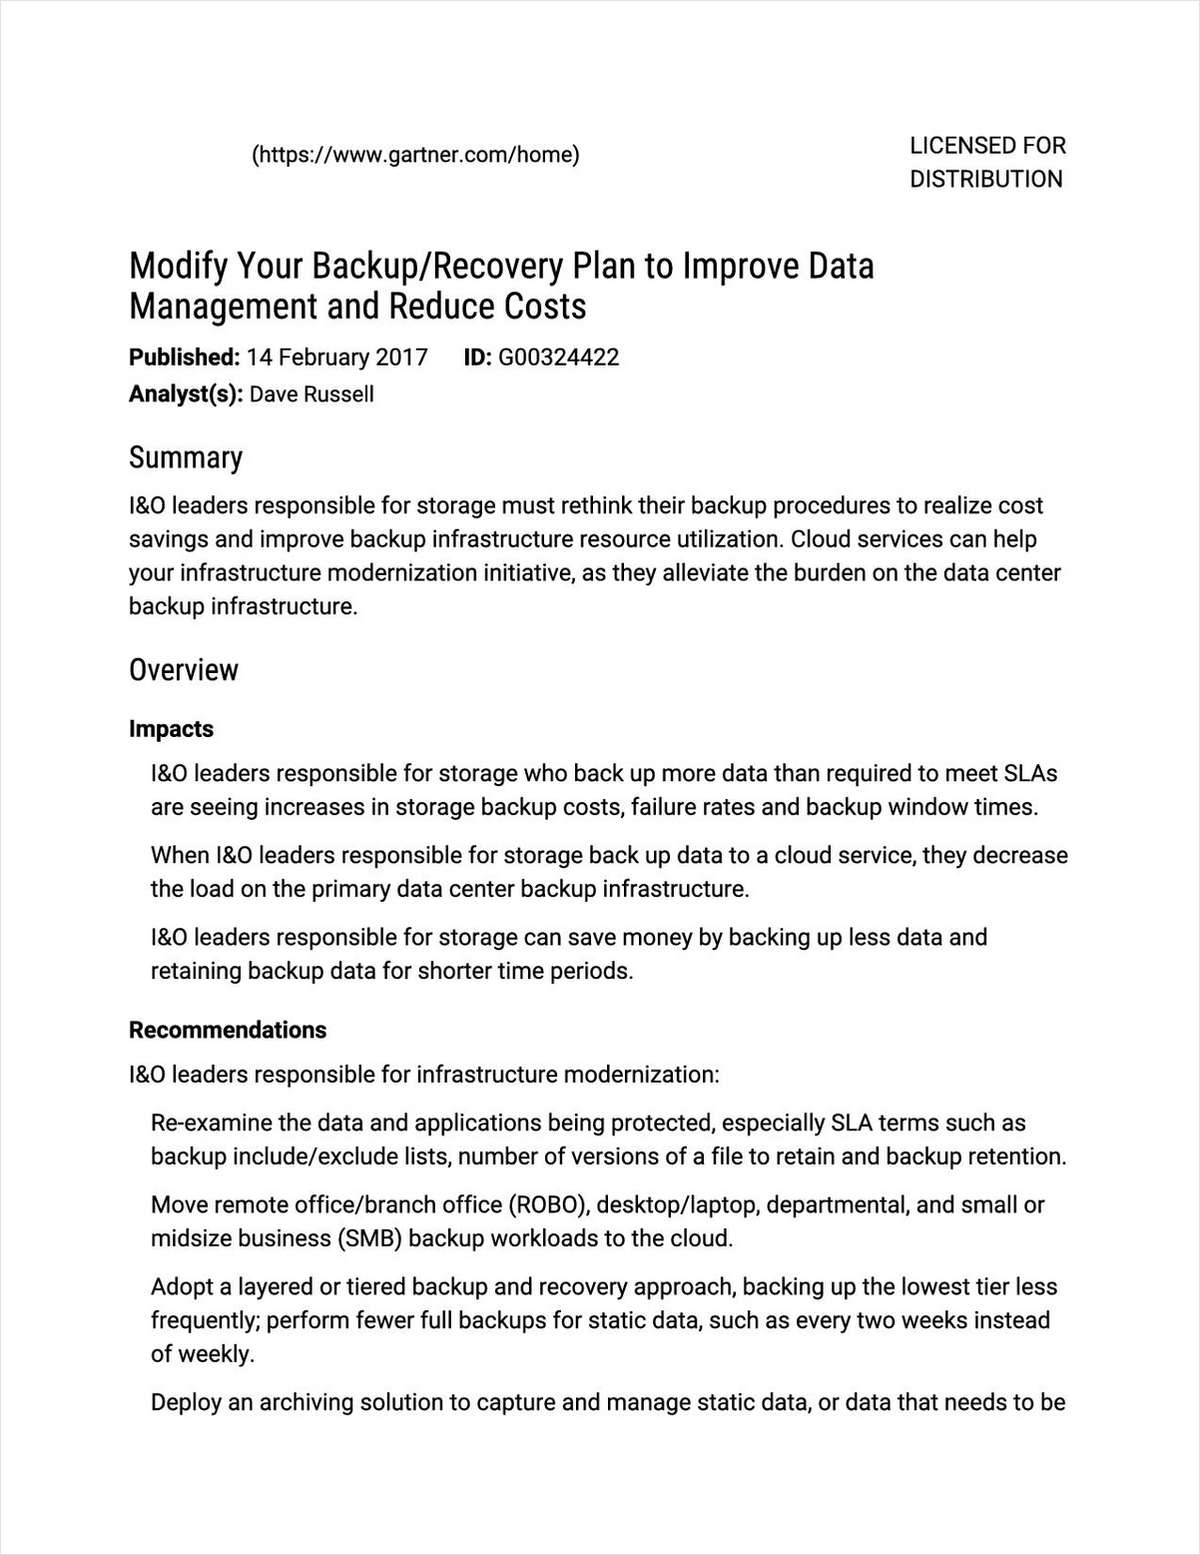 Gartner: Modify Your Backup Recovery Plan